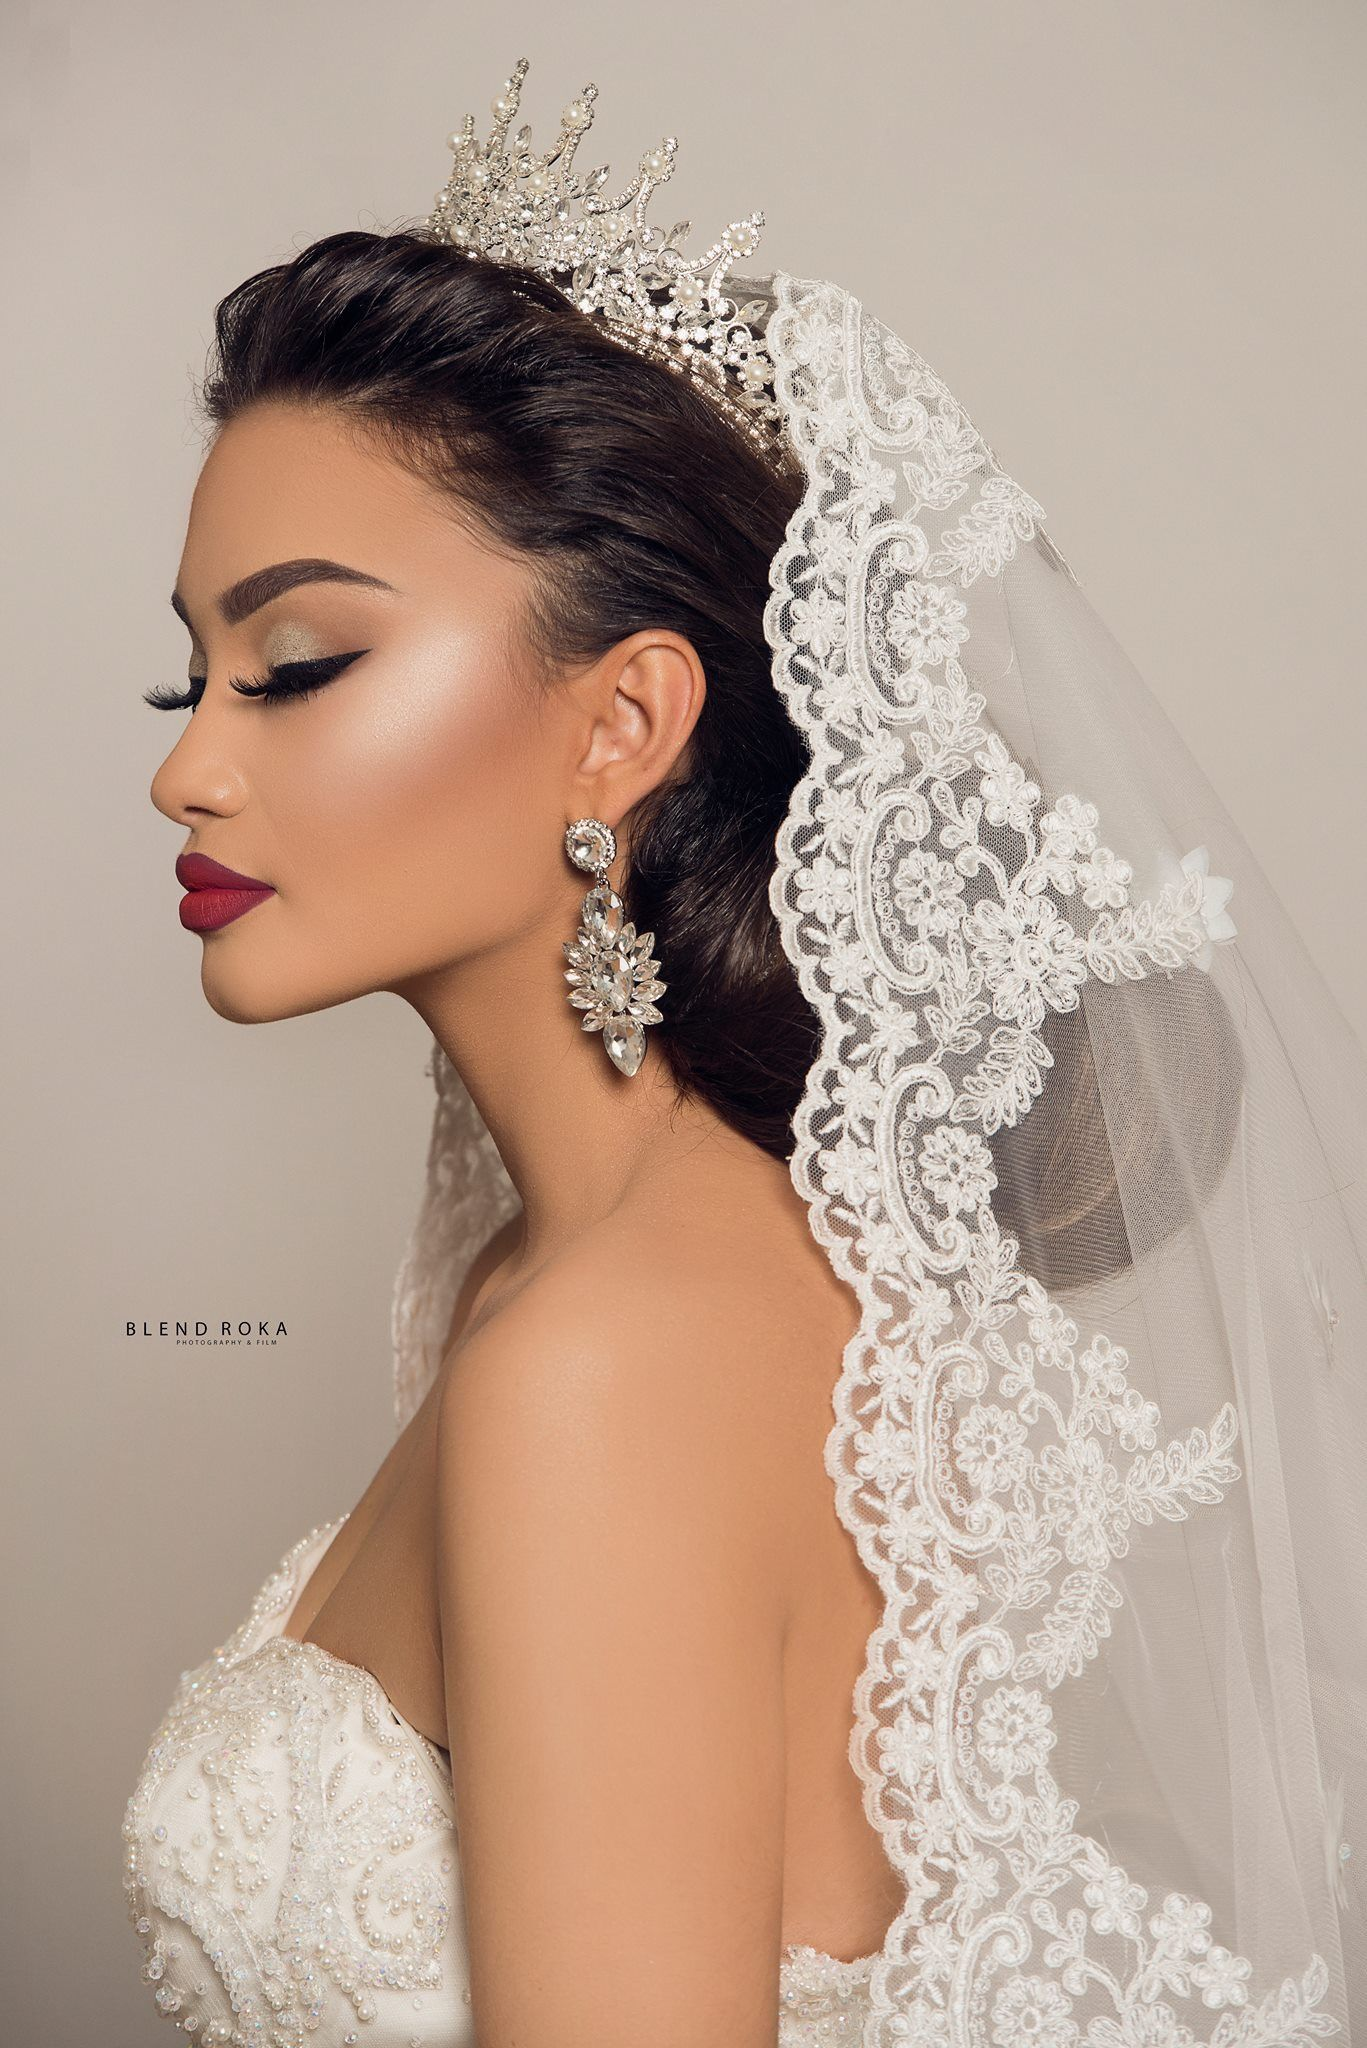 Bride Bridal Bridehairstyles Veil Wedding Weddingdresses